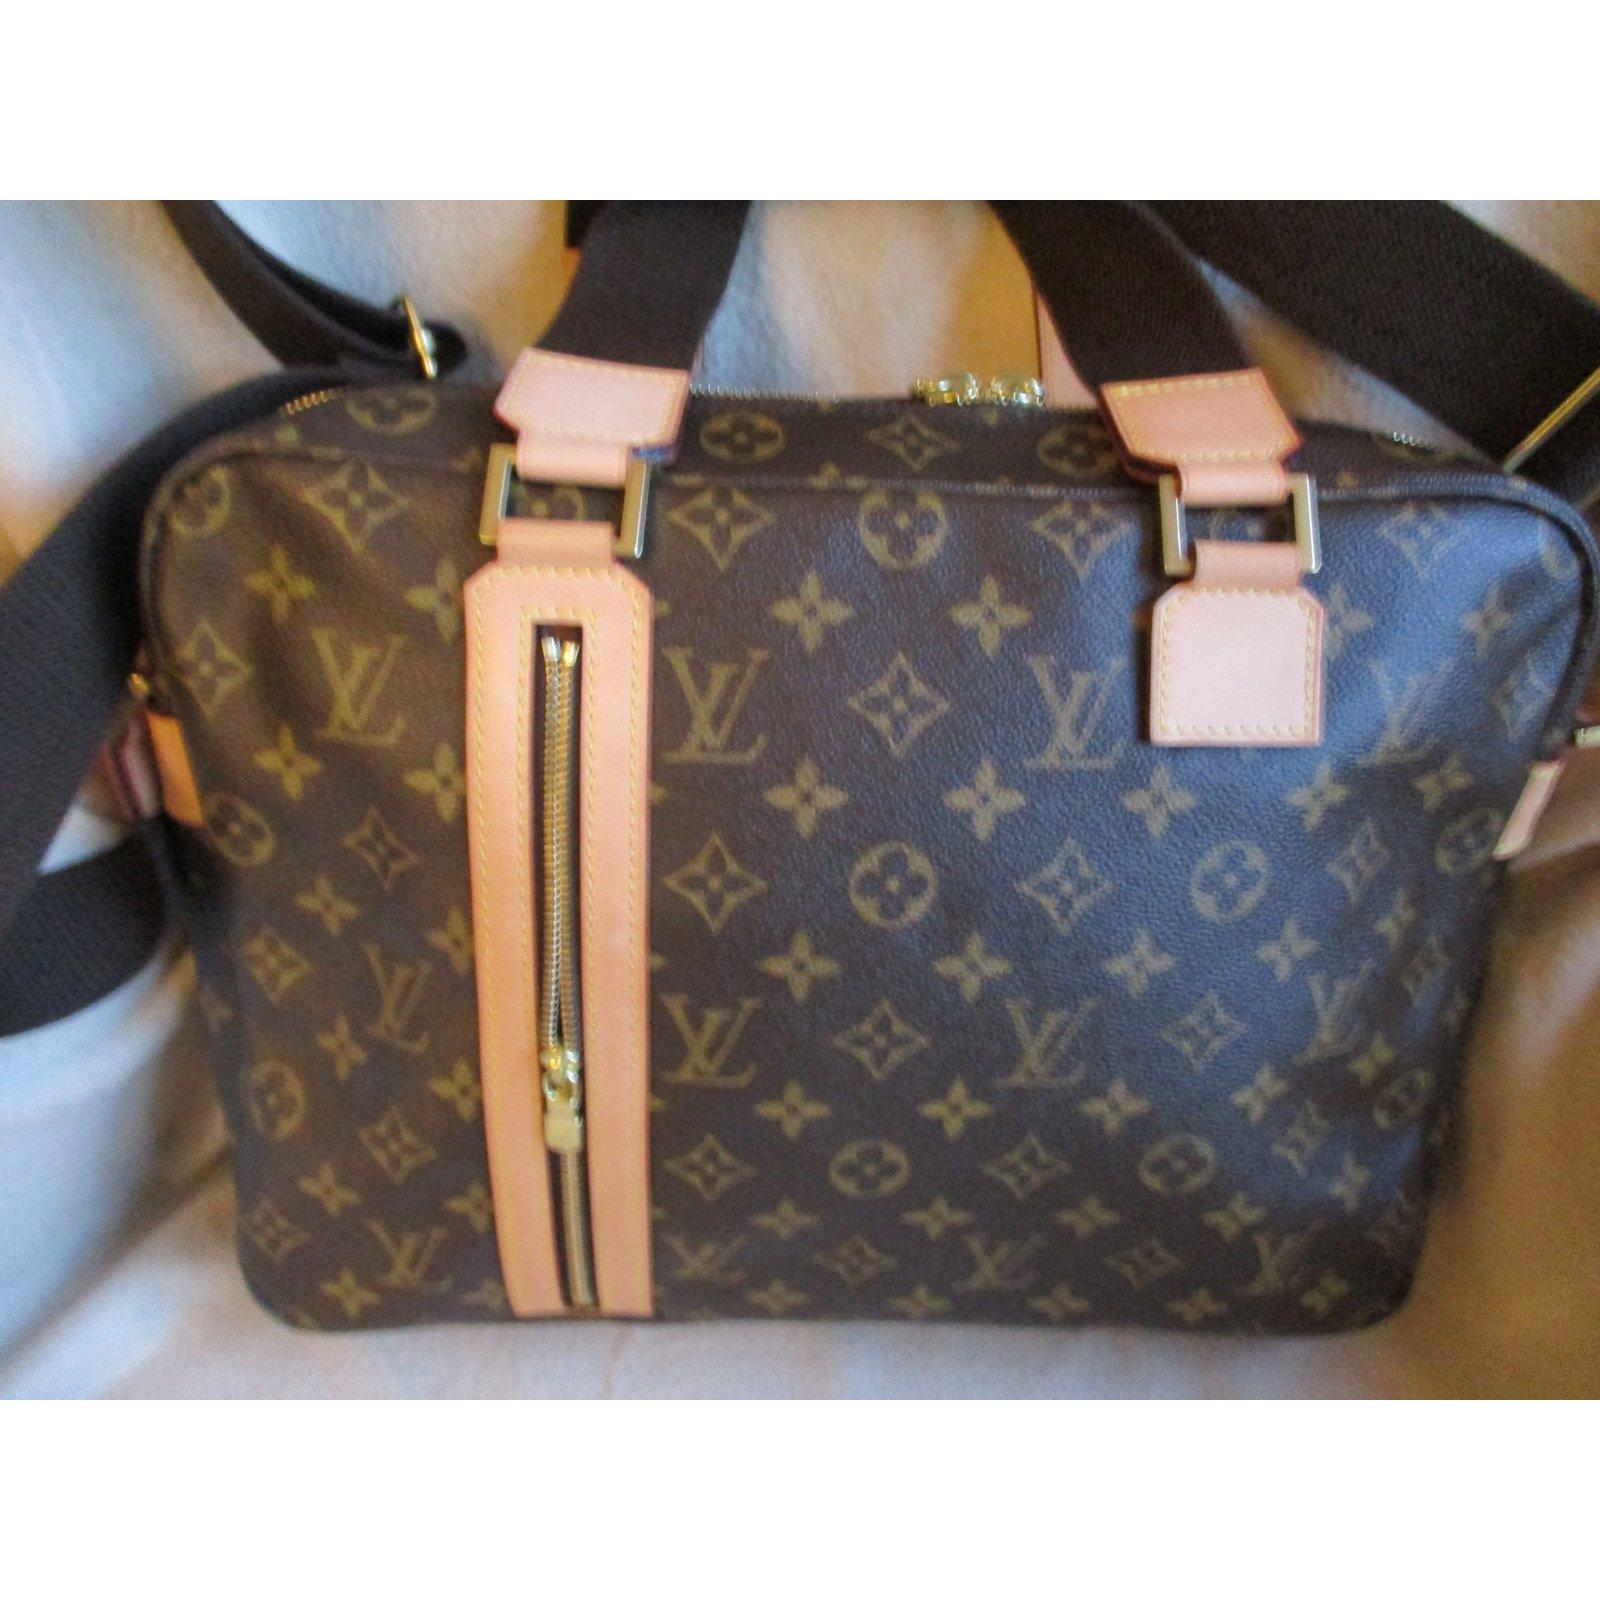 35b430d1cf93 Facebook · Pin This. Louis Vuitton Bag